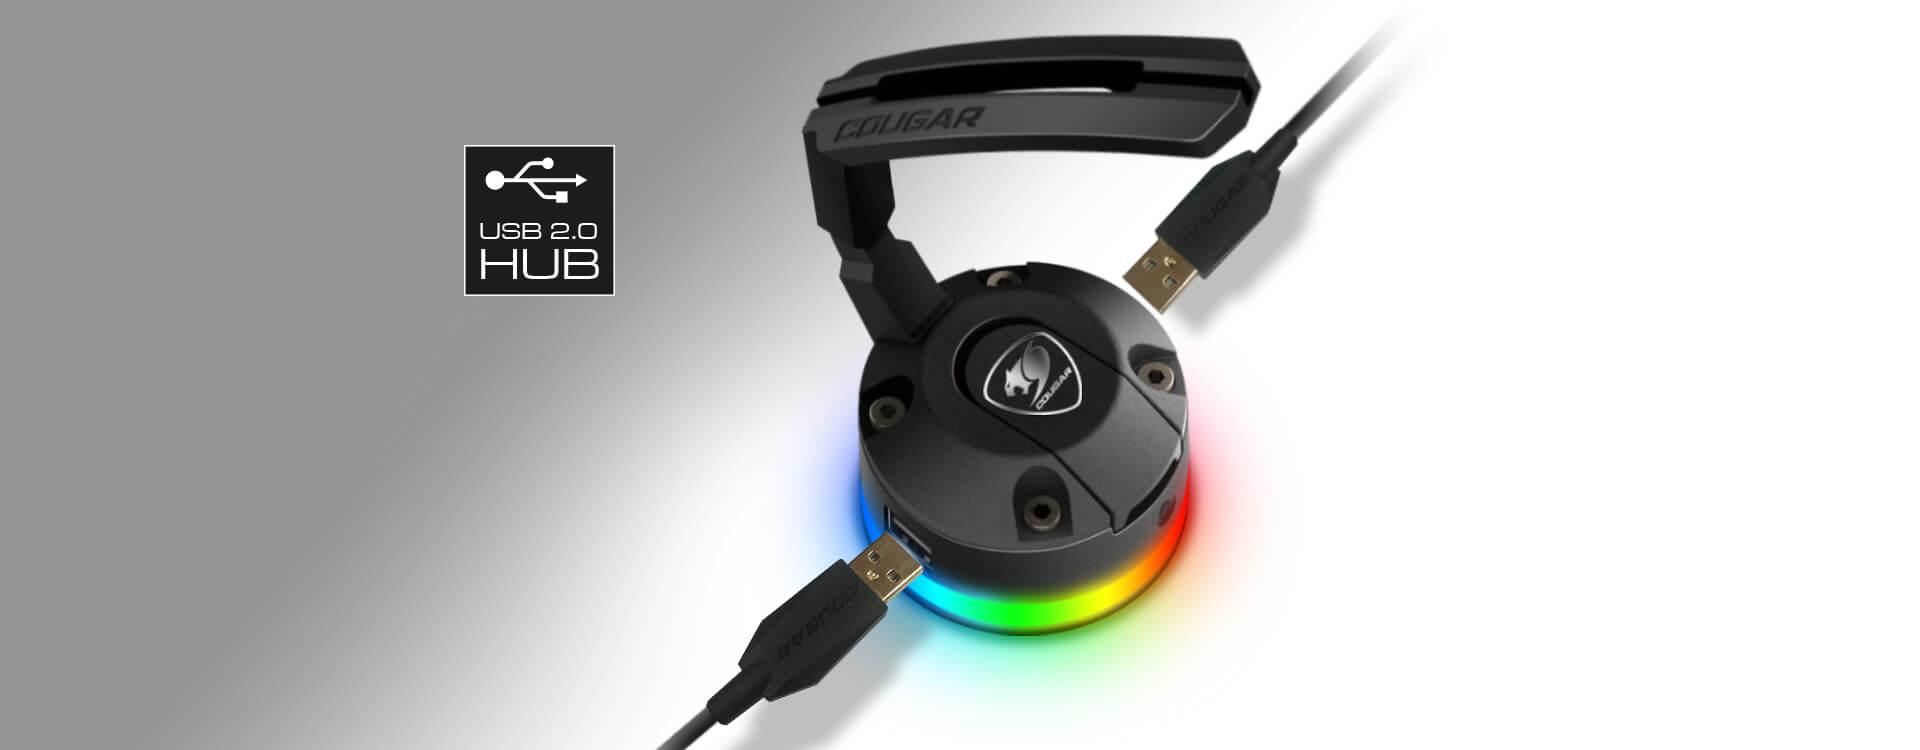 Hub USB pratique